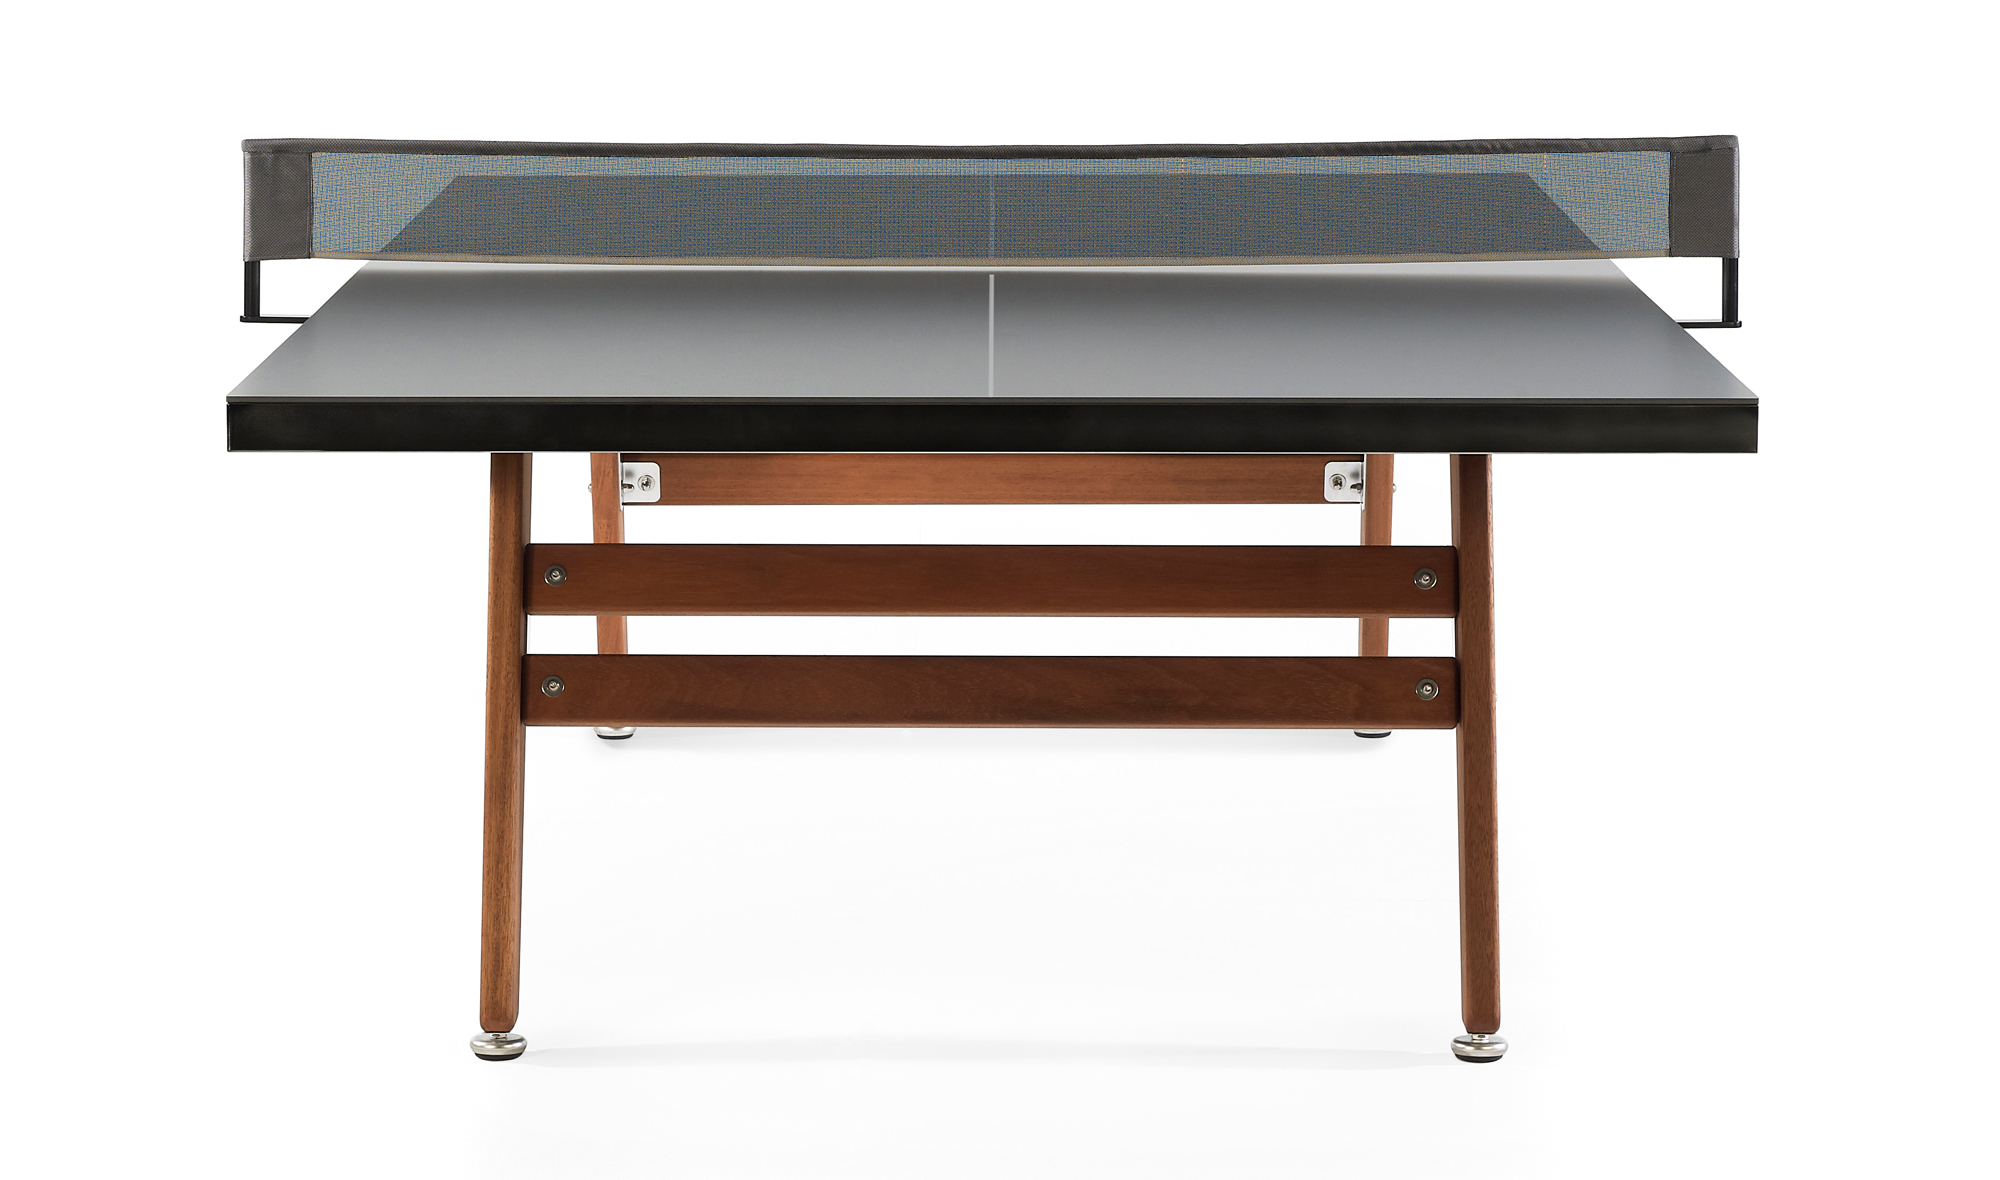 6fed8eedd -Mesa de escritorio madera ping pong en Portobellostreet.es